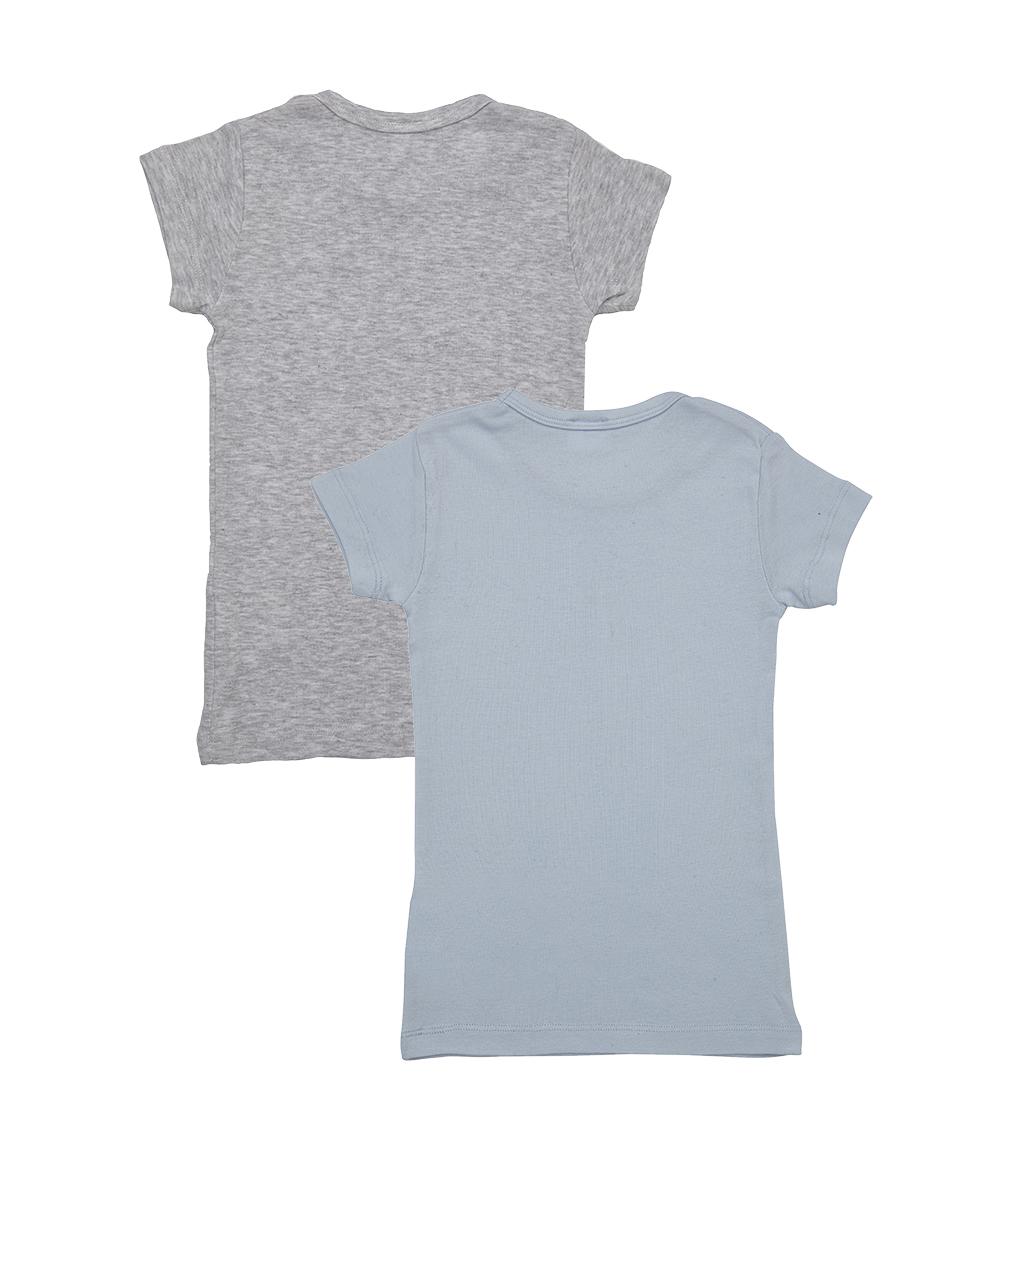 Pack 2 t-shirt grigia e azzurra con cane e stella - Prénatal